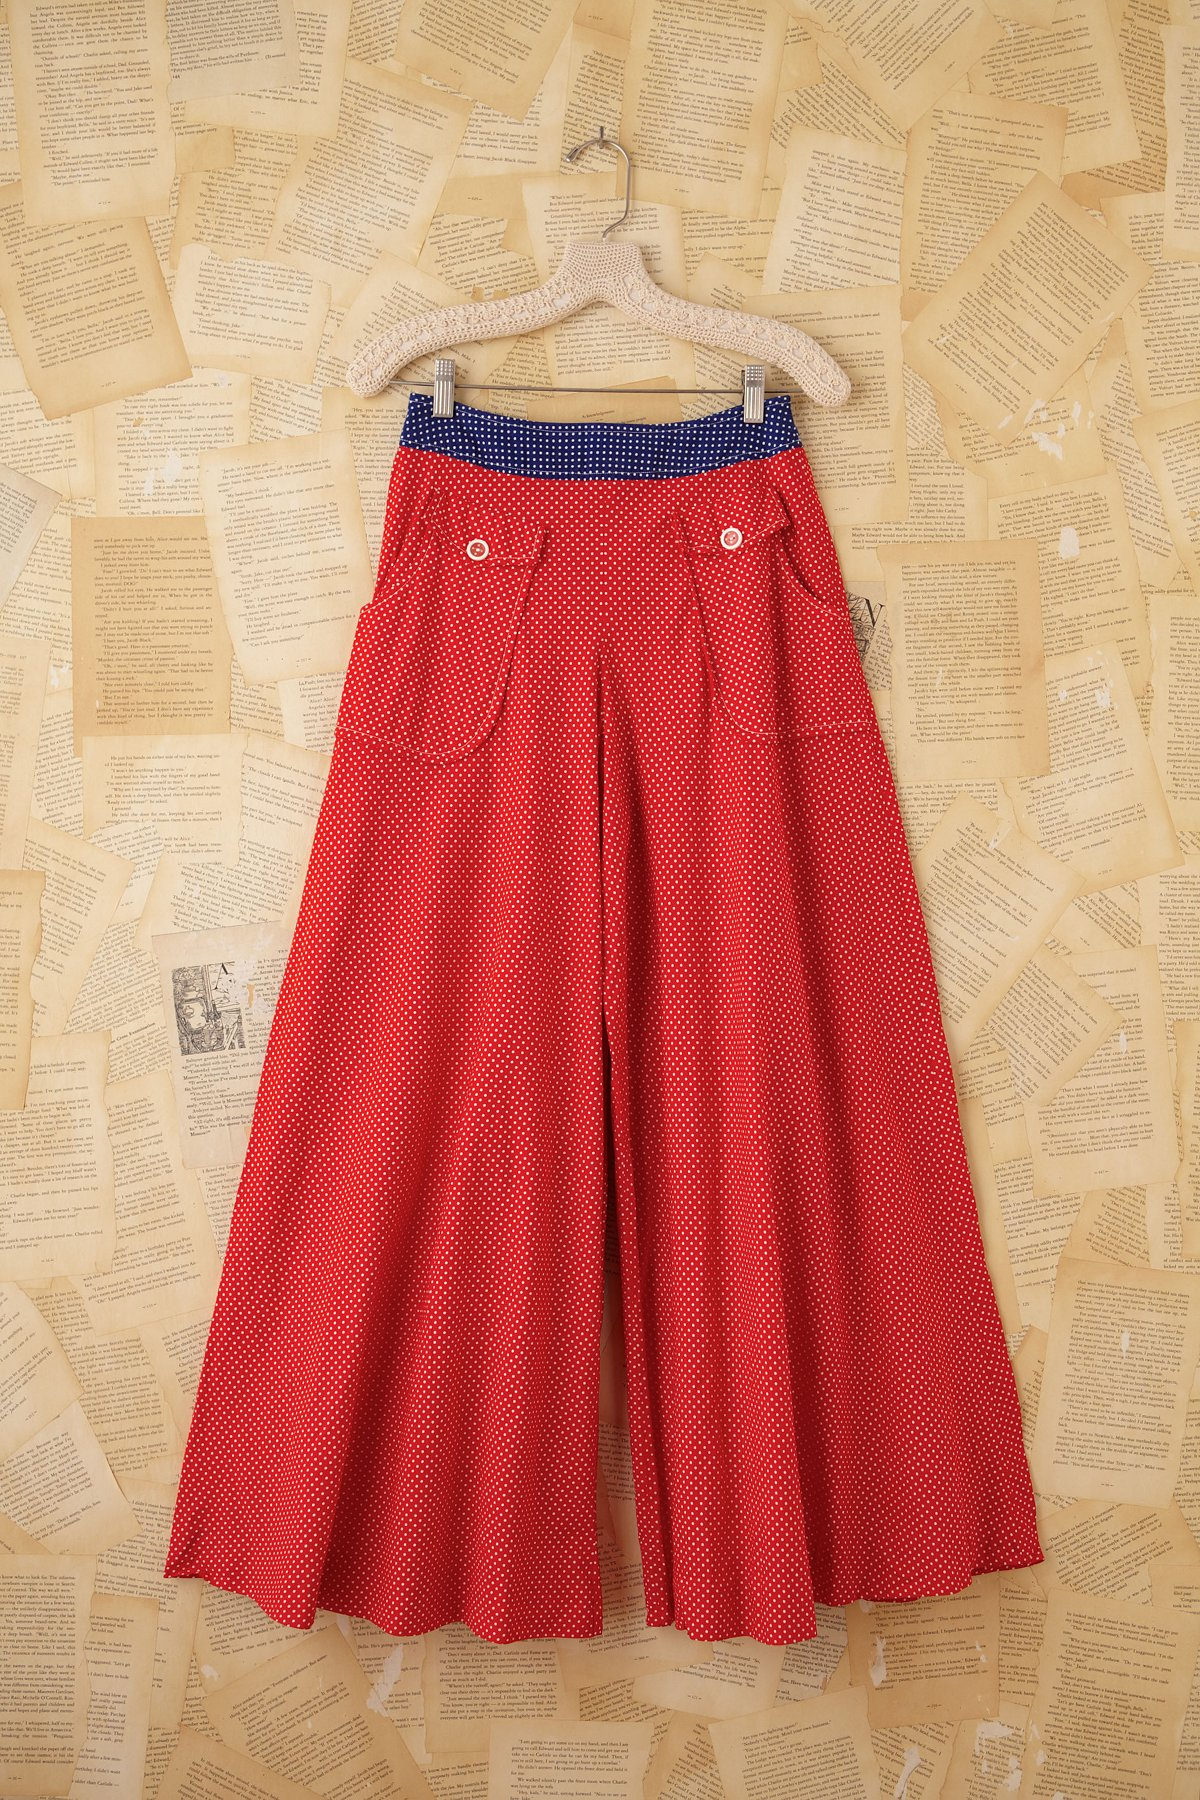 Vintage Patriotic Polka Dotted High-Waisted Pants